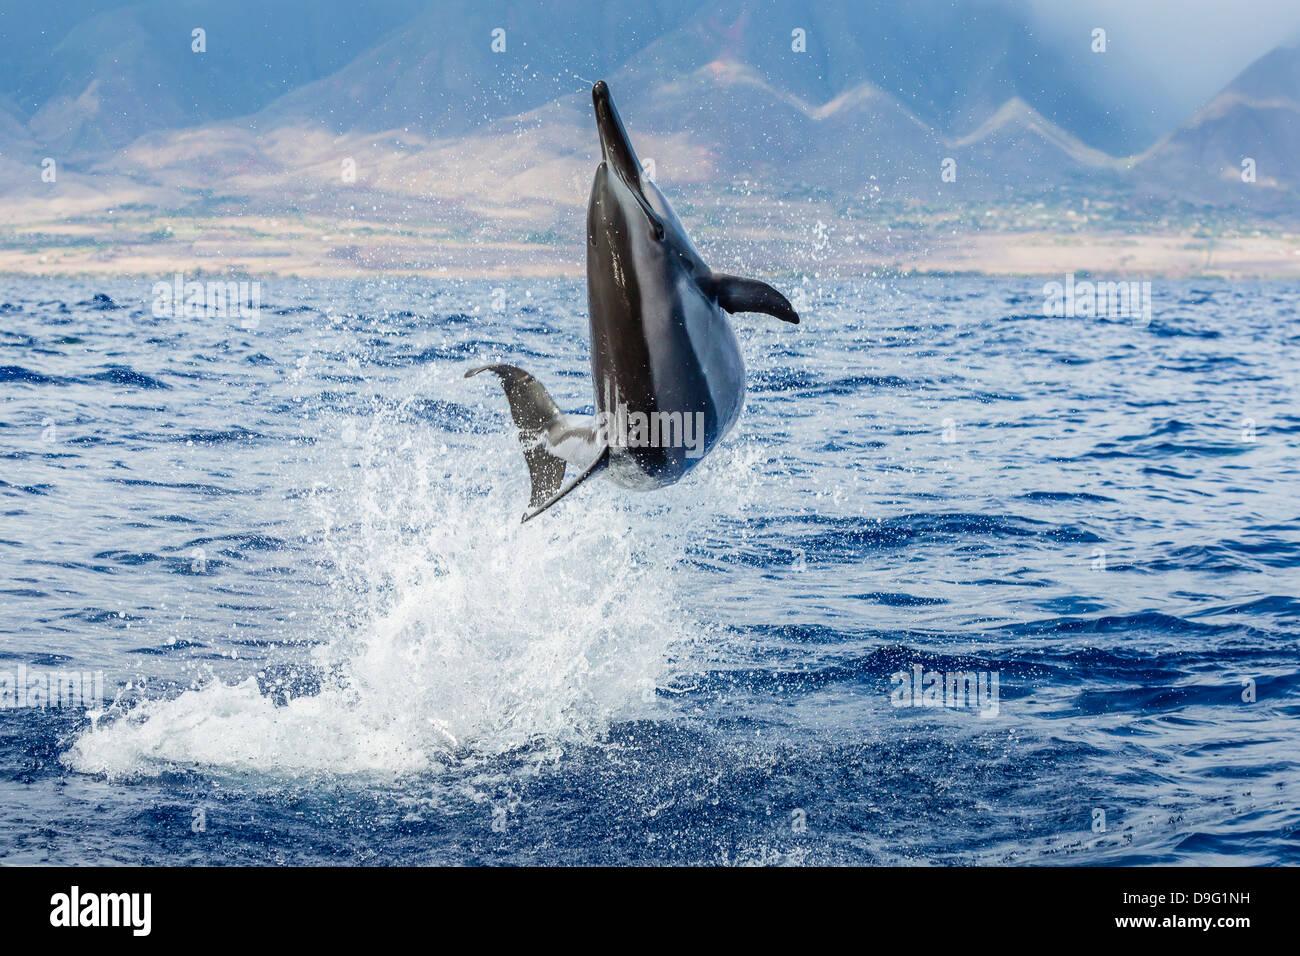 Hawaiian spinner dolphin (Stenella longirostris), AuAu Channel, Maui, Hawaii, United States of America - Stock Image